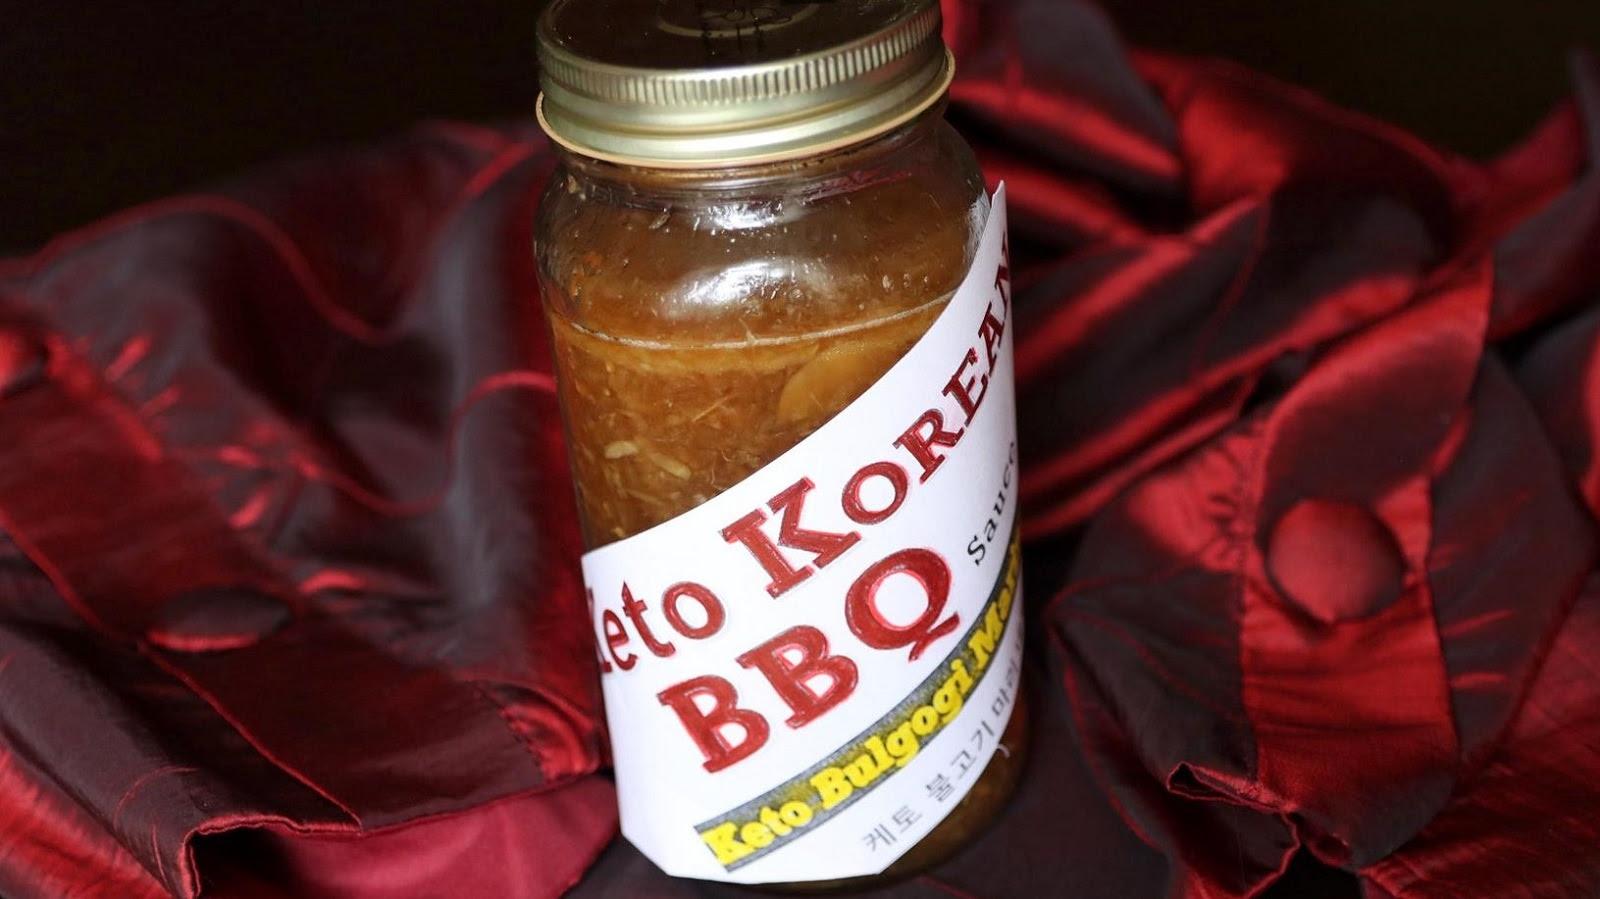 Keto Bulgogi Sauce - Keto Korean BBQ Sauce - Keto Meals ...